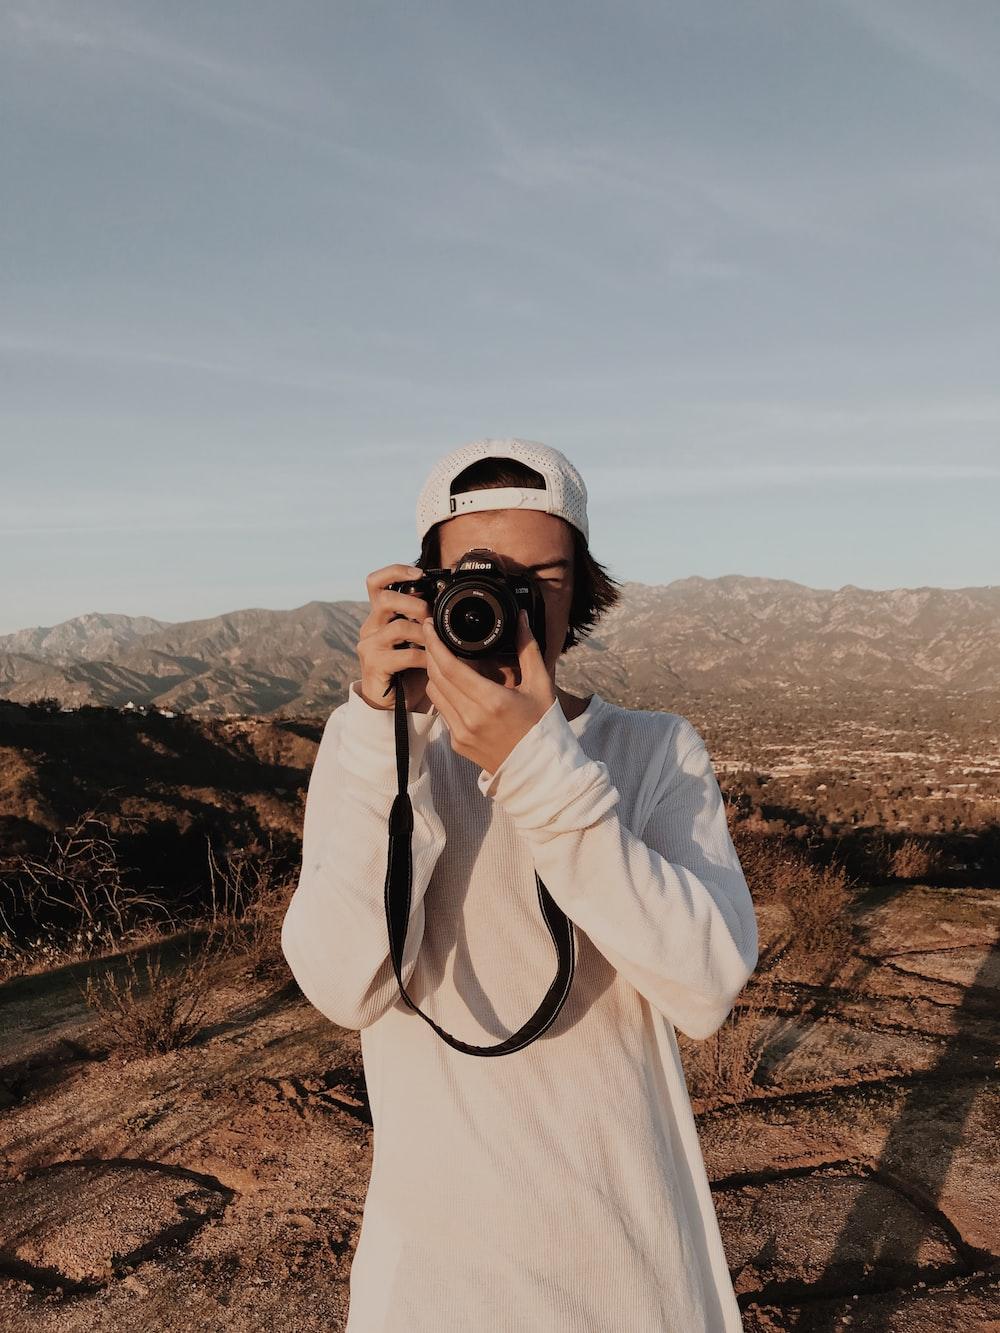 man holding camera standing near mountain ranges